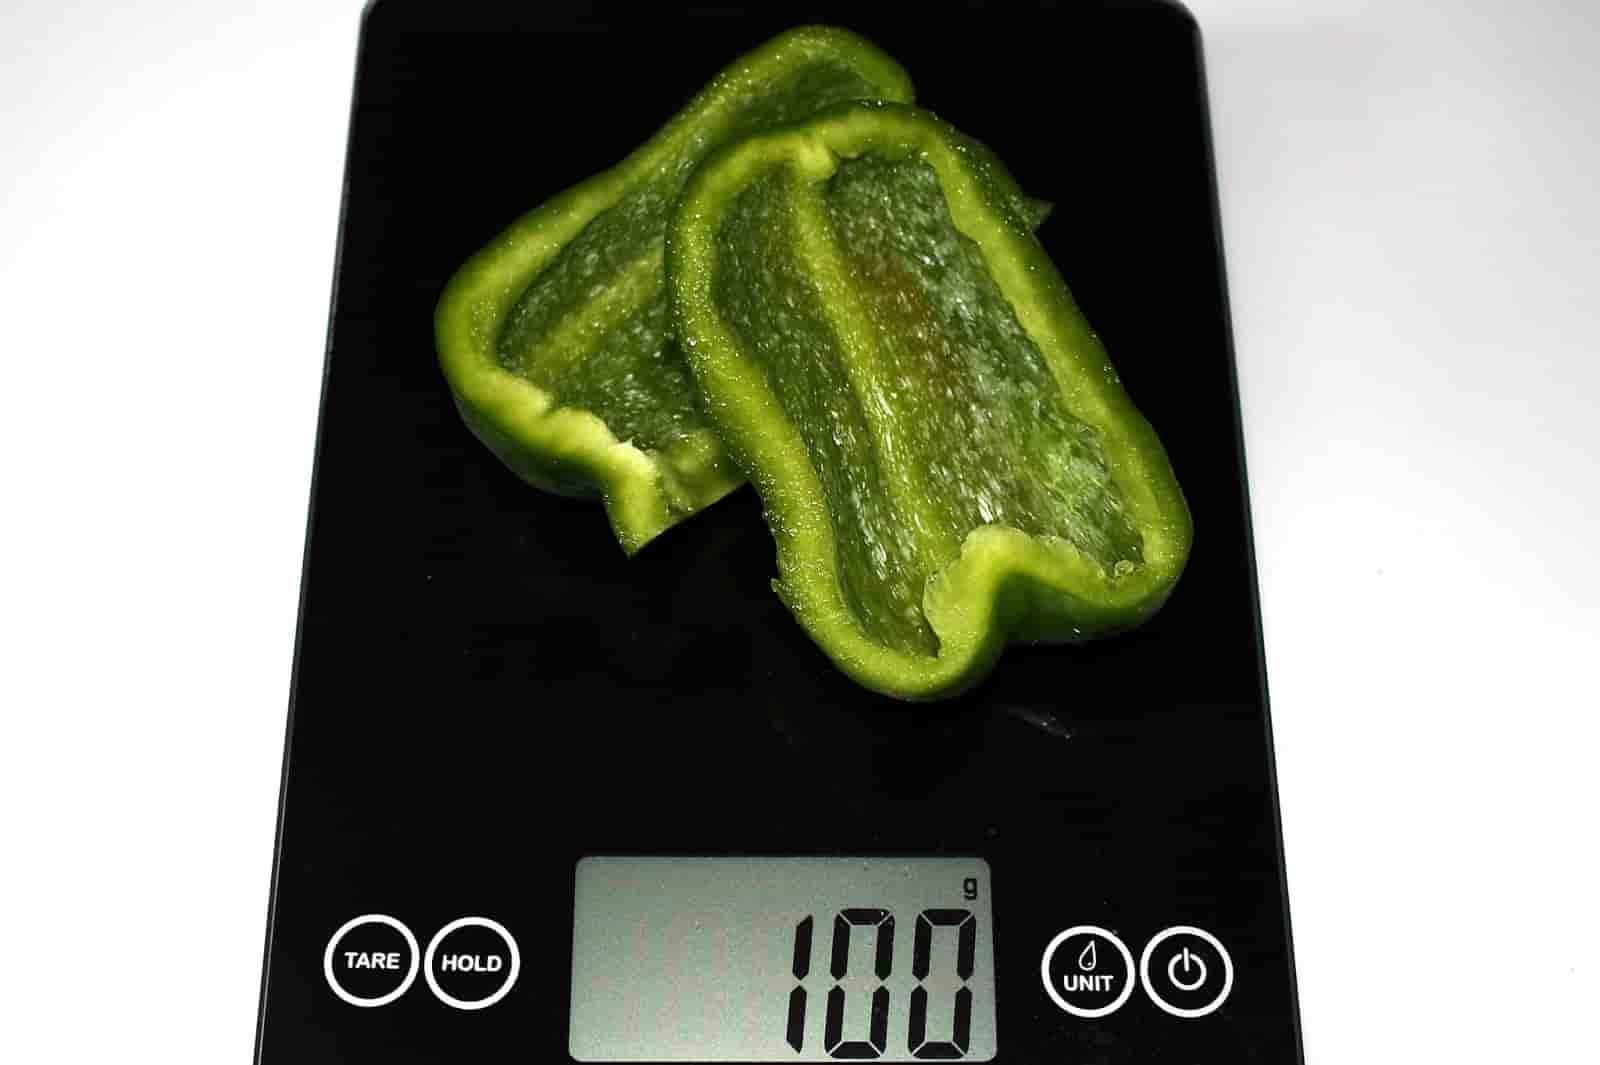 100 грамм перца (Вес продуктов)